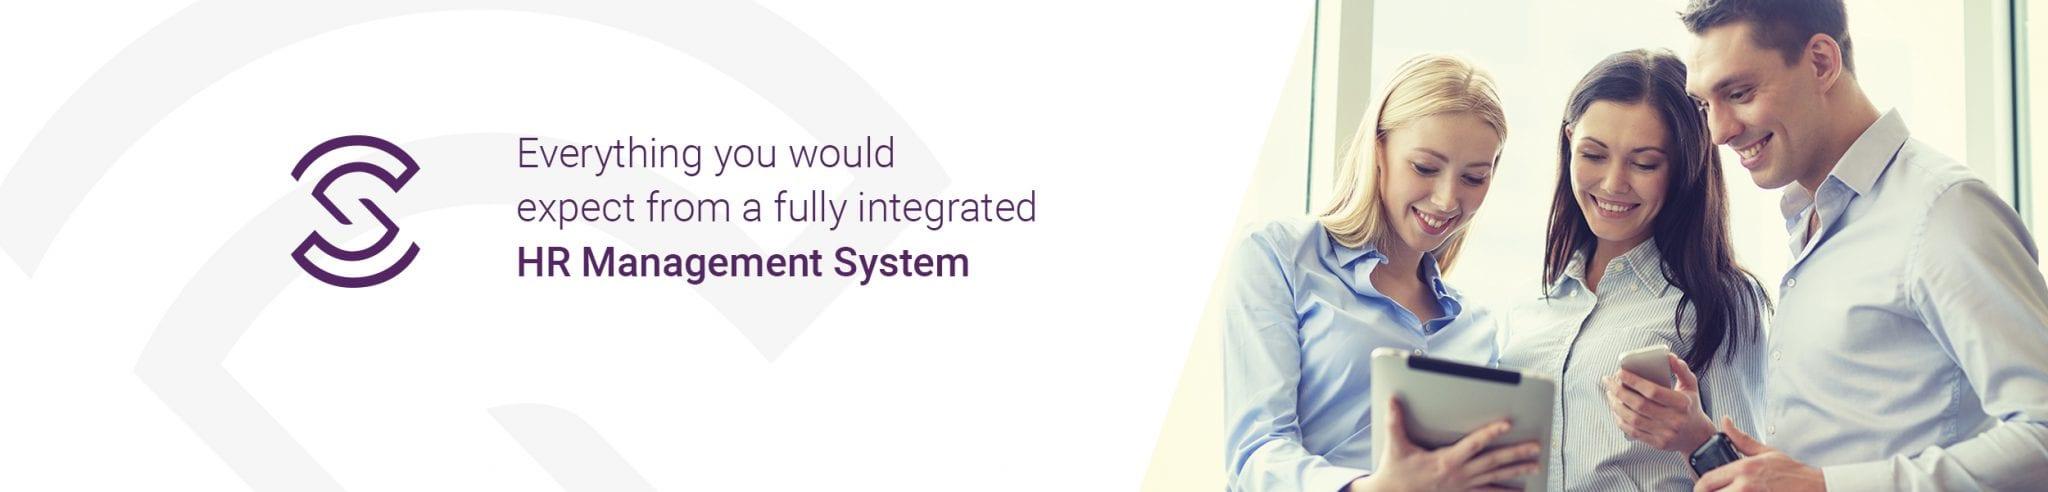 Strandum HR Software